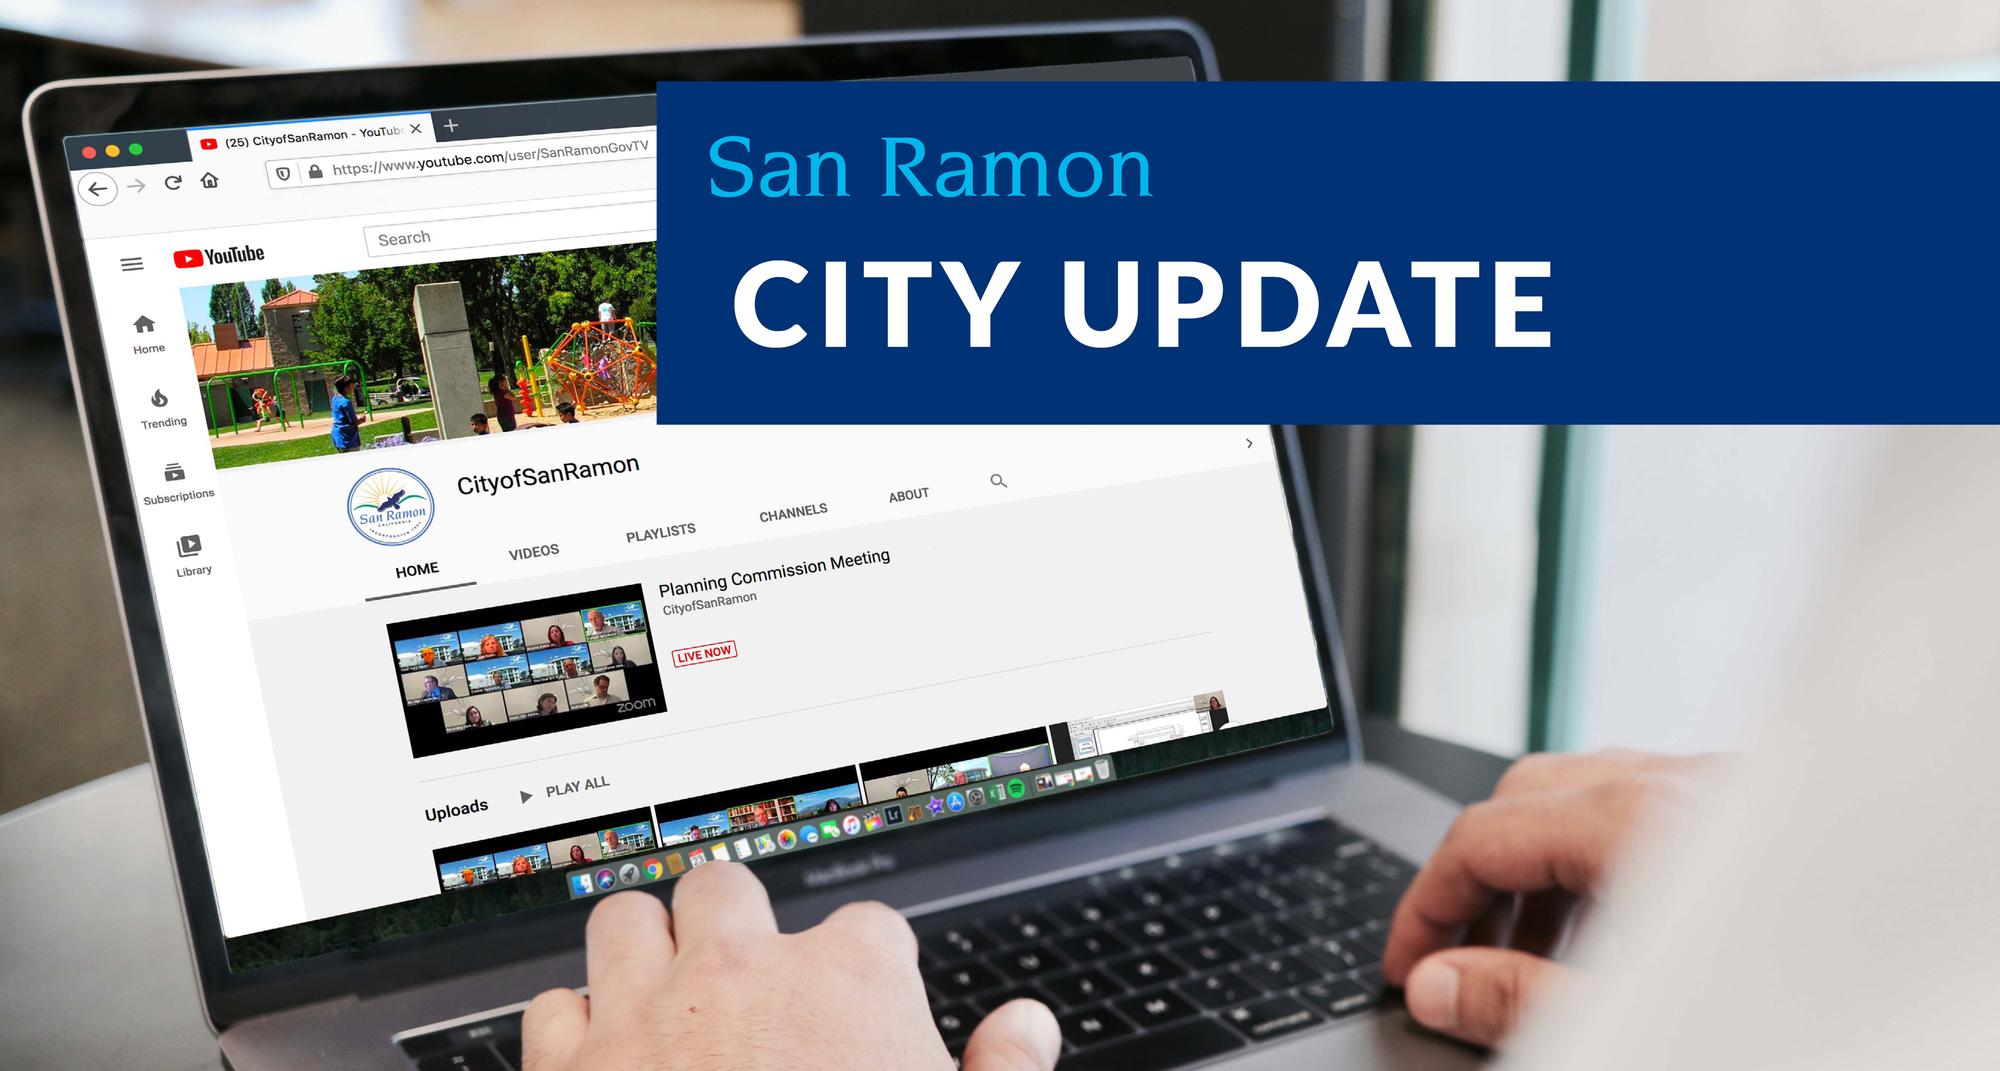 City Update